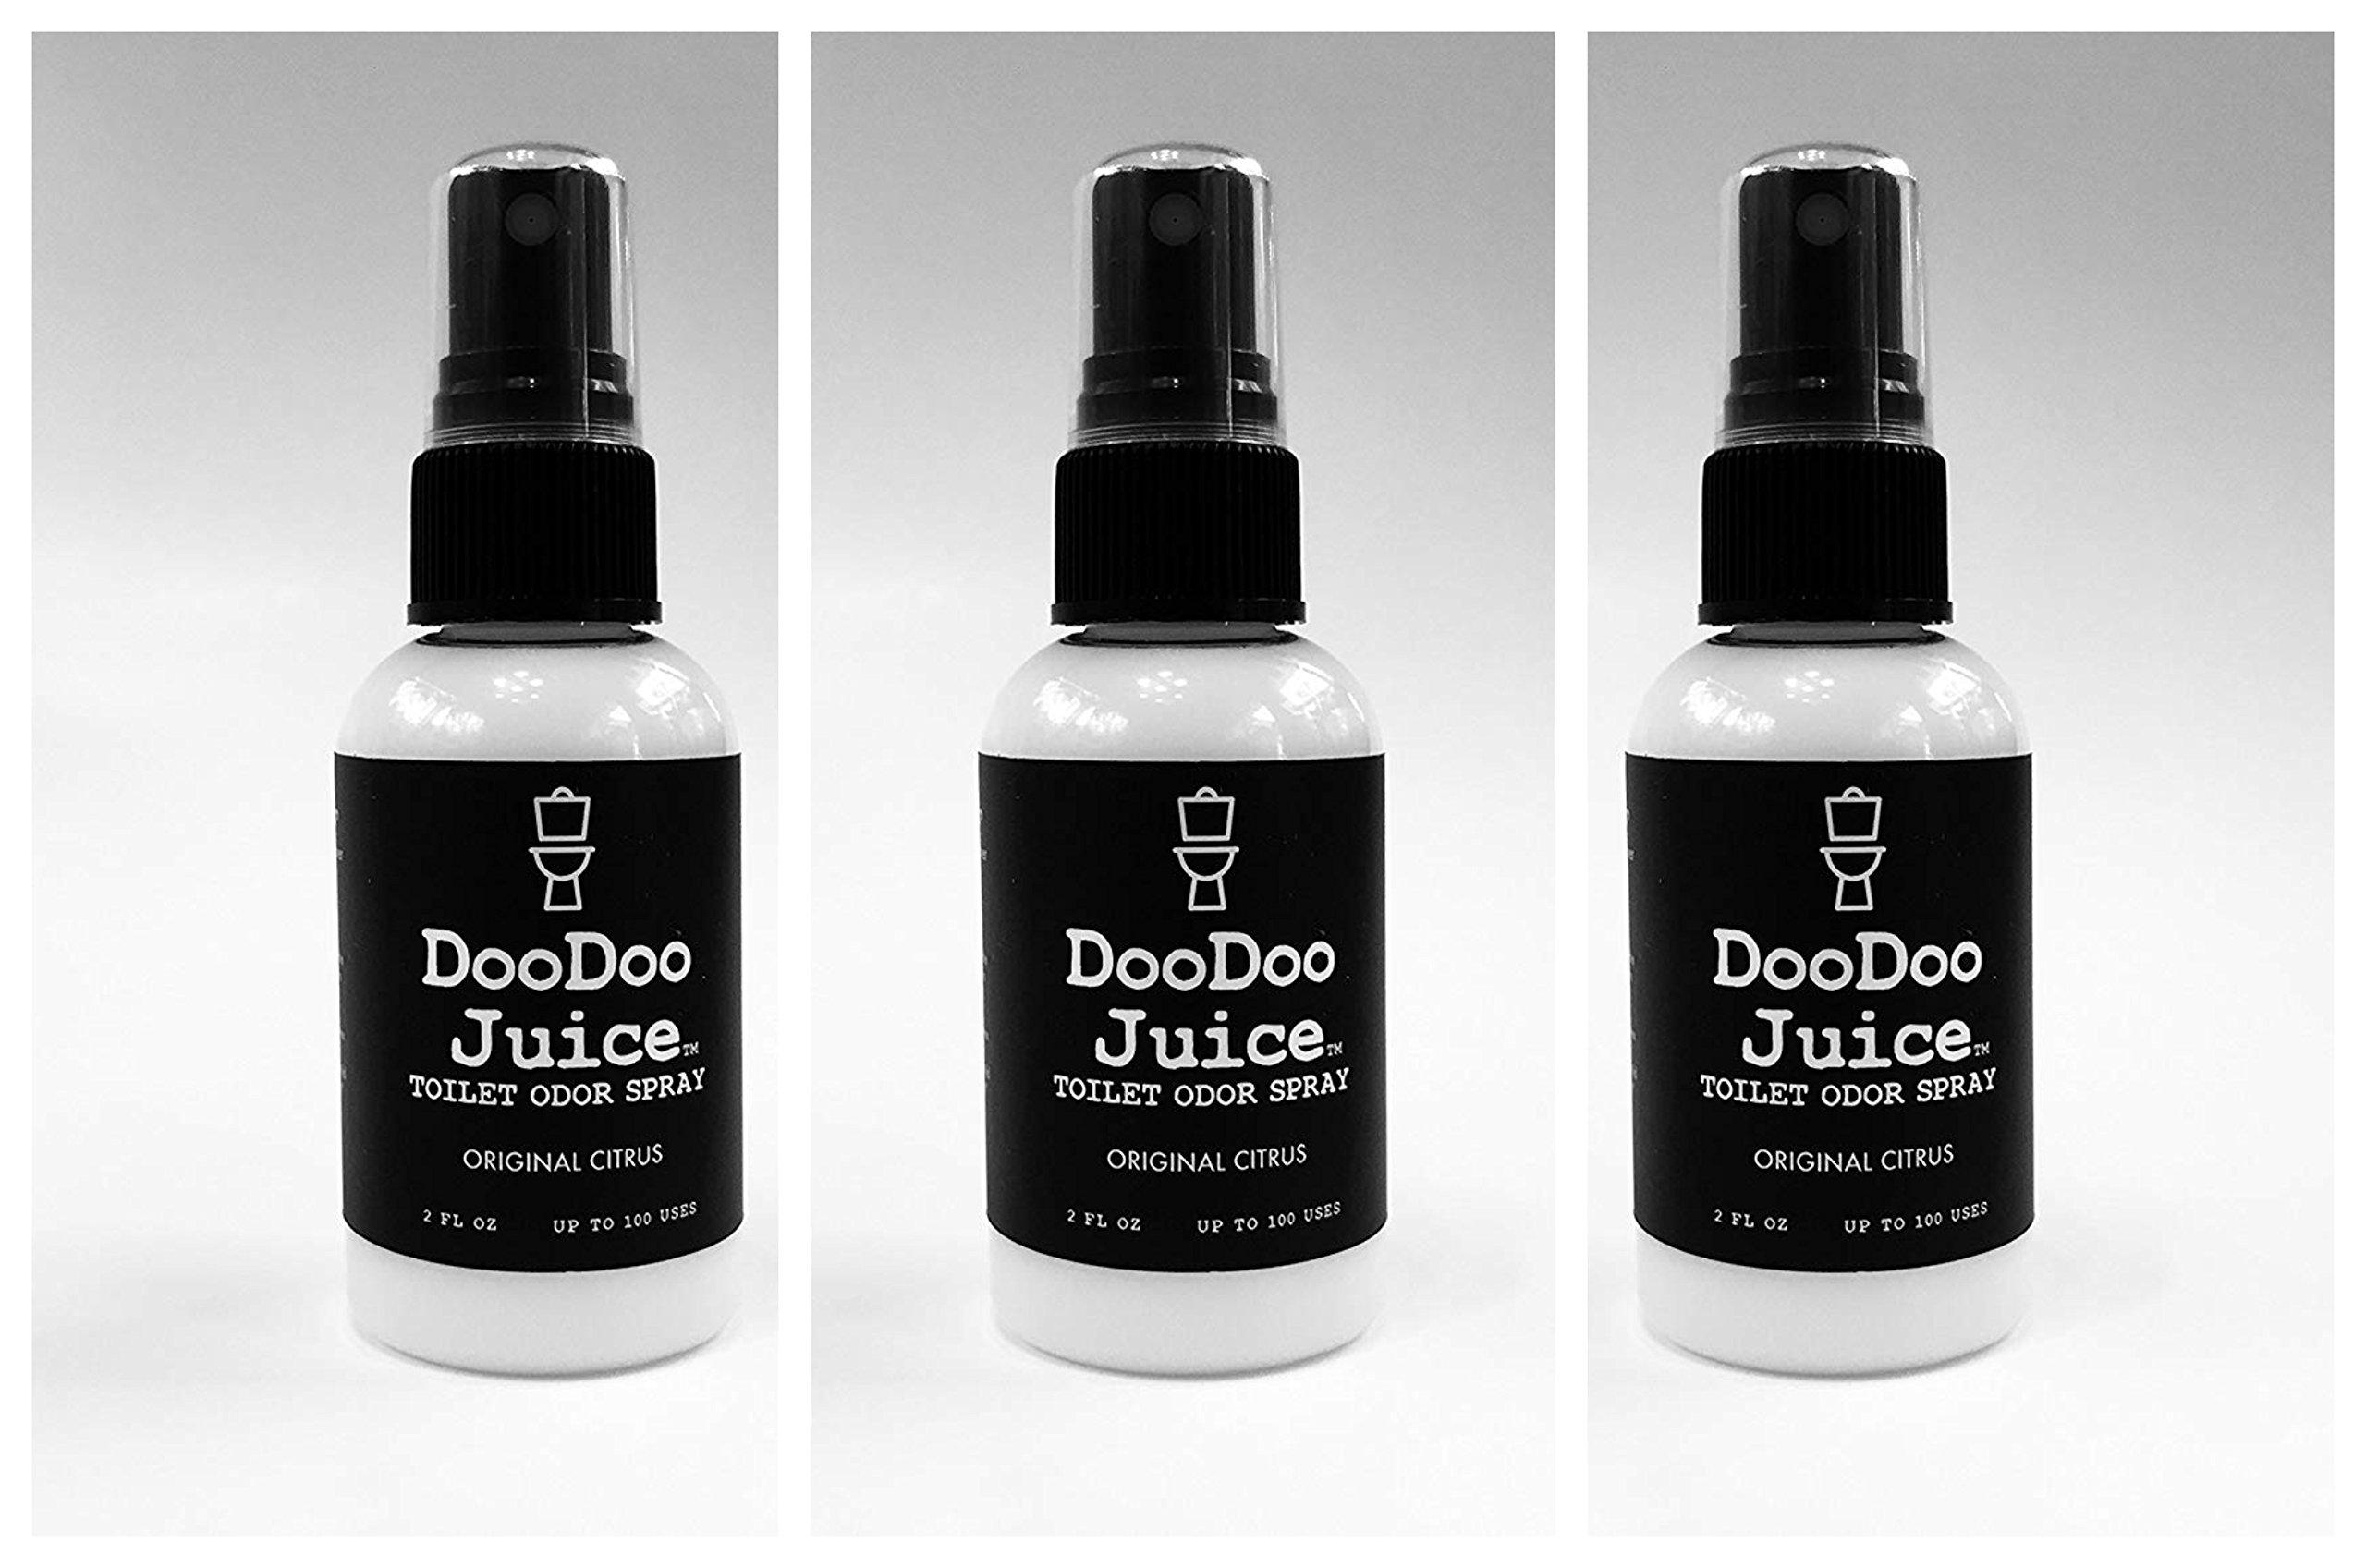 DooDoo Juice Toilet Odor Spray Bottle, 2 oz, Original Citrus (3 Pack)